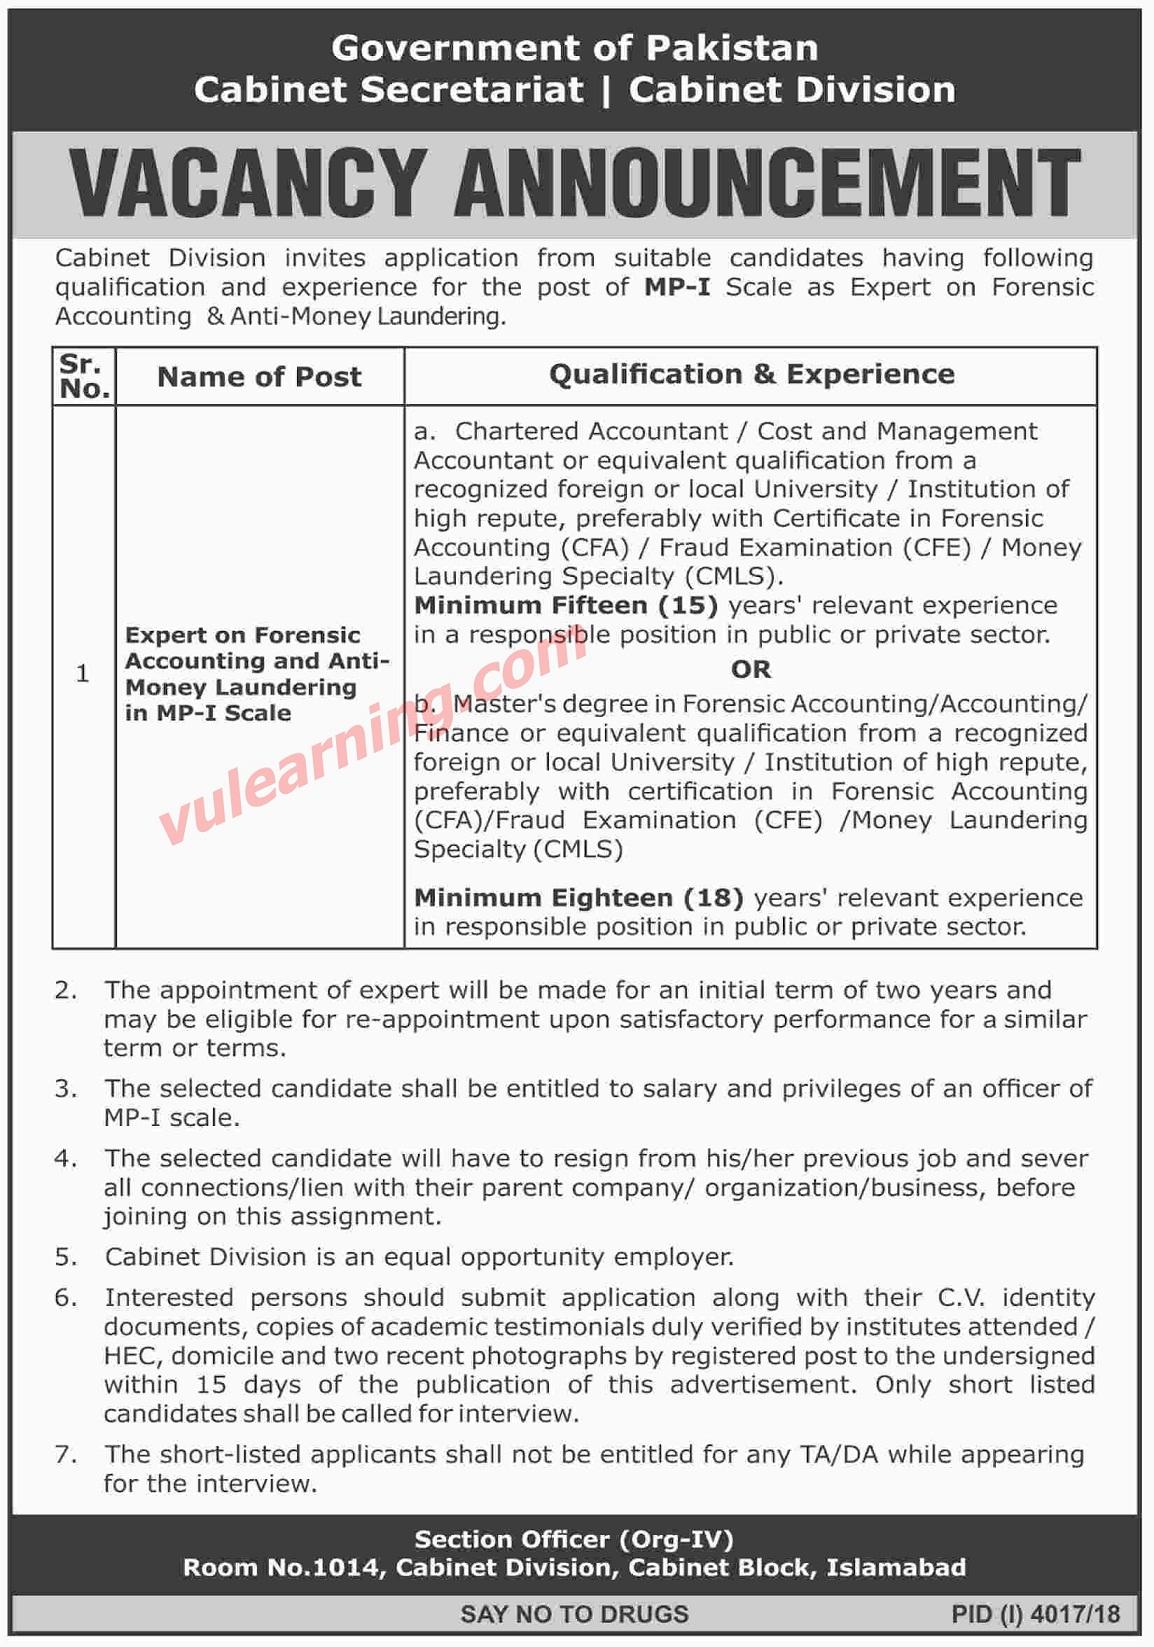 Govt Of Pakistan Cabinet Secretariat Cabinet Division